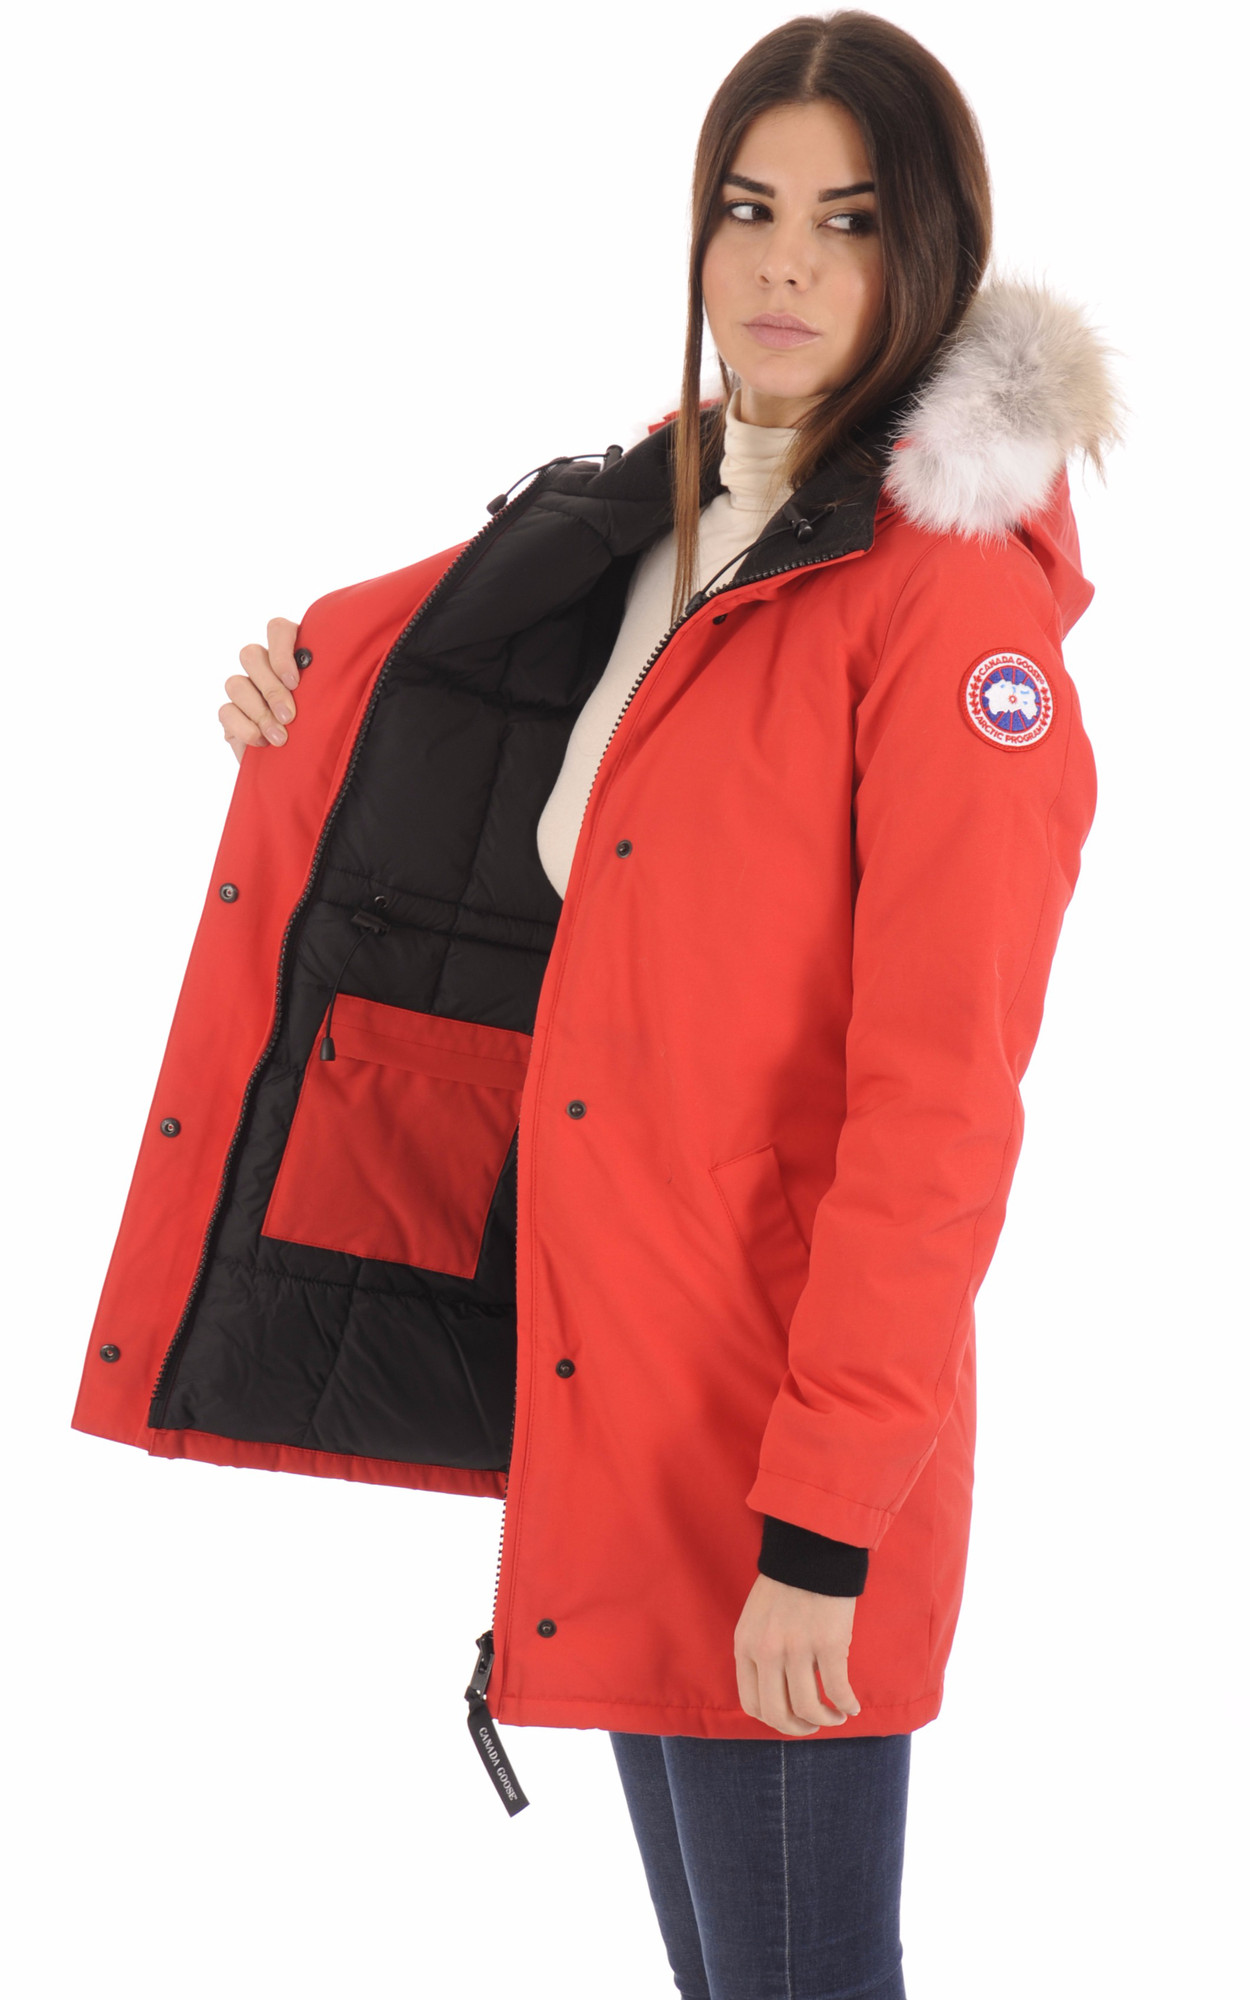 Parka Doudoune La Goose Canada Red Victoria Canadienne BBqaTUg 5d59ec562a77